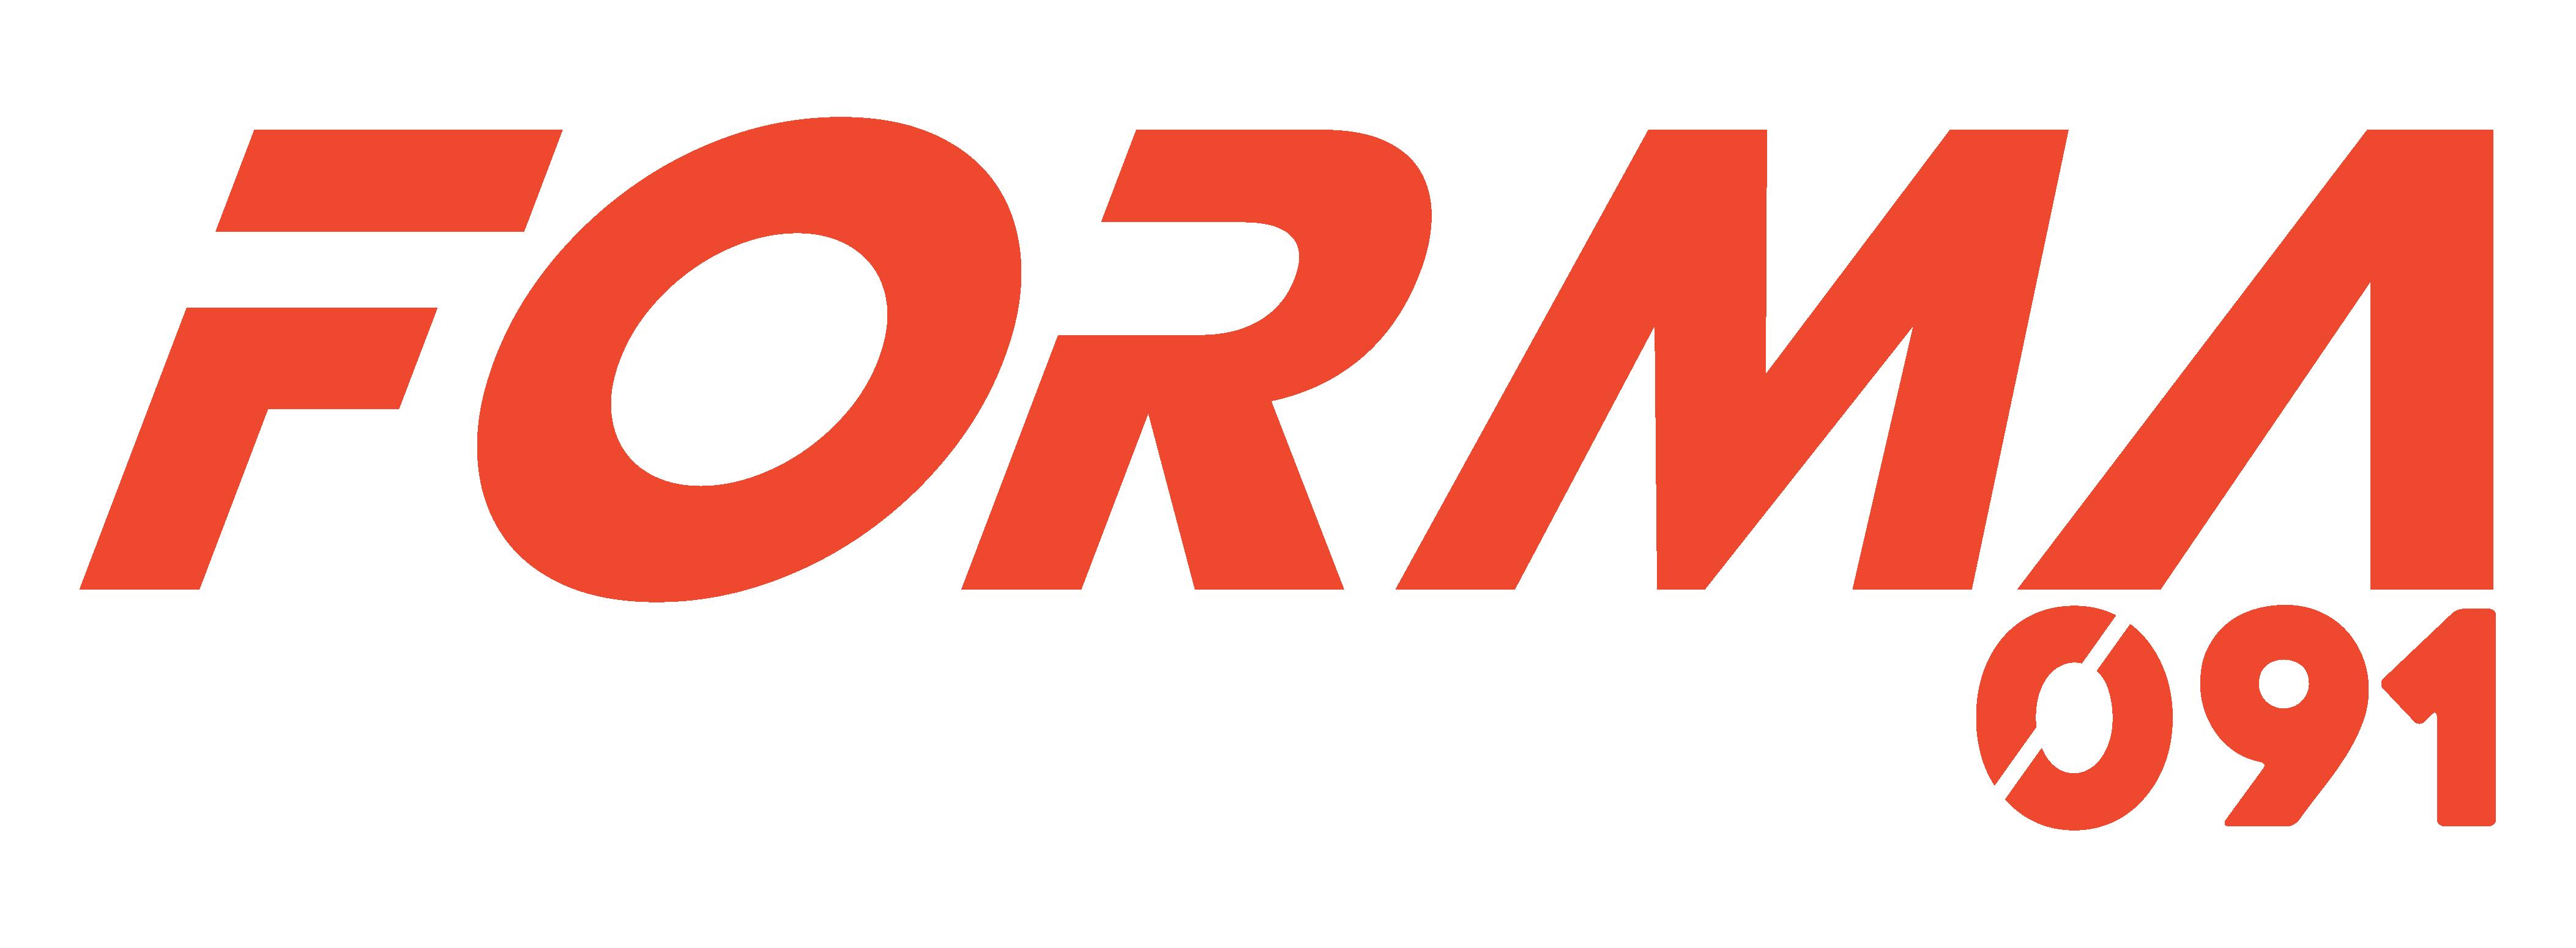 Forma091